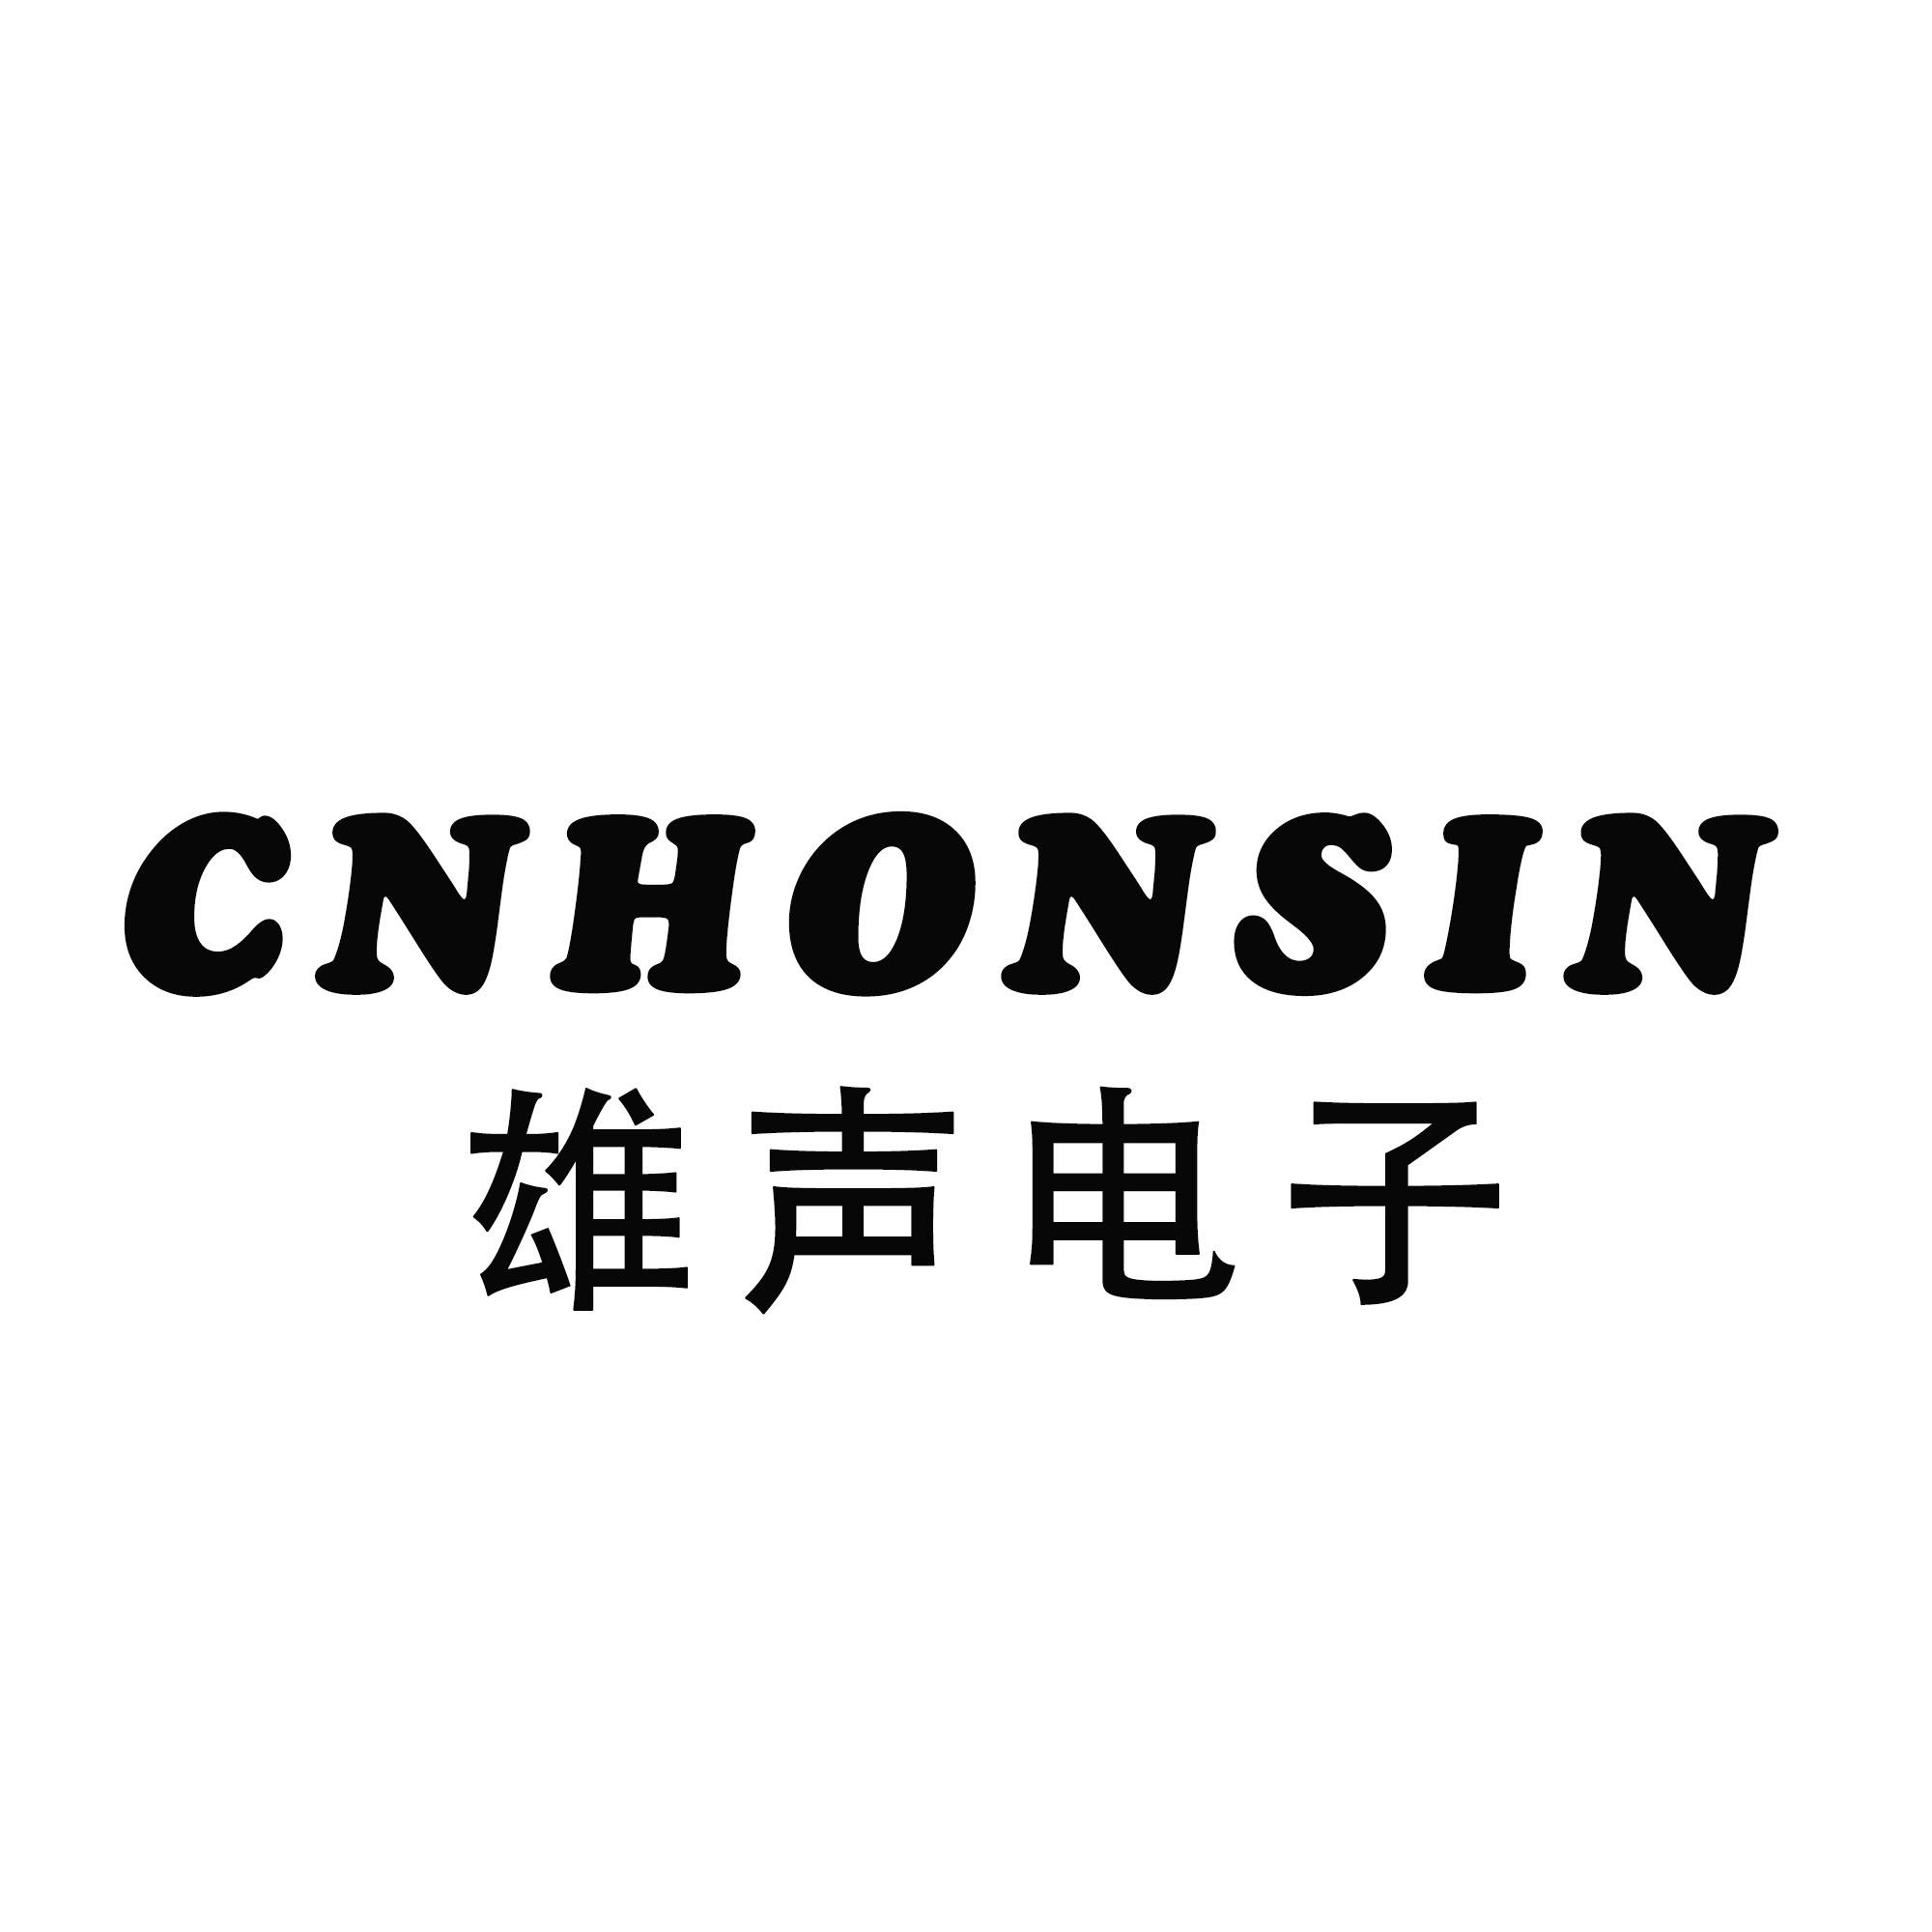 CNHONSIN雄声电子品牌的...